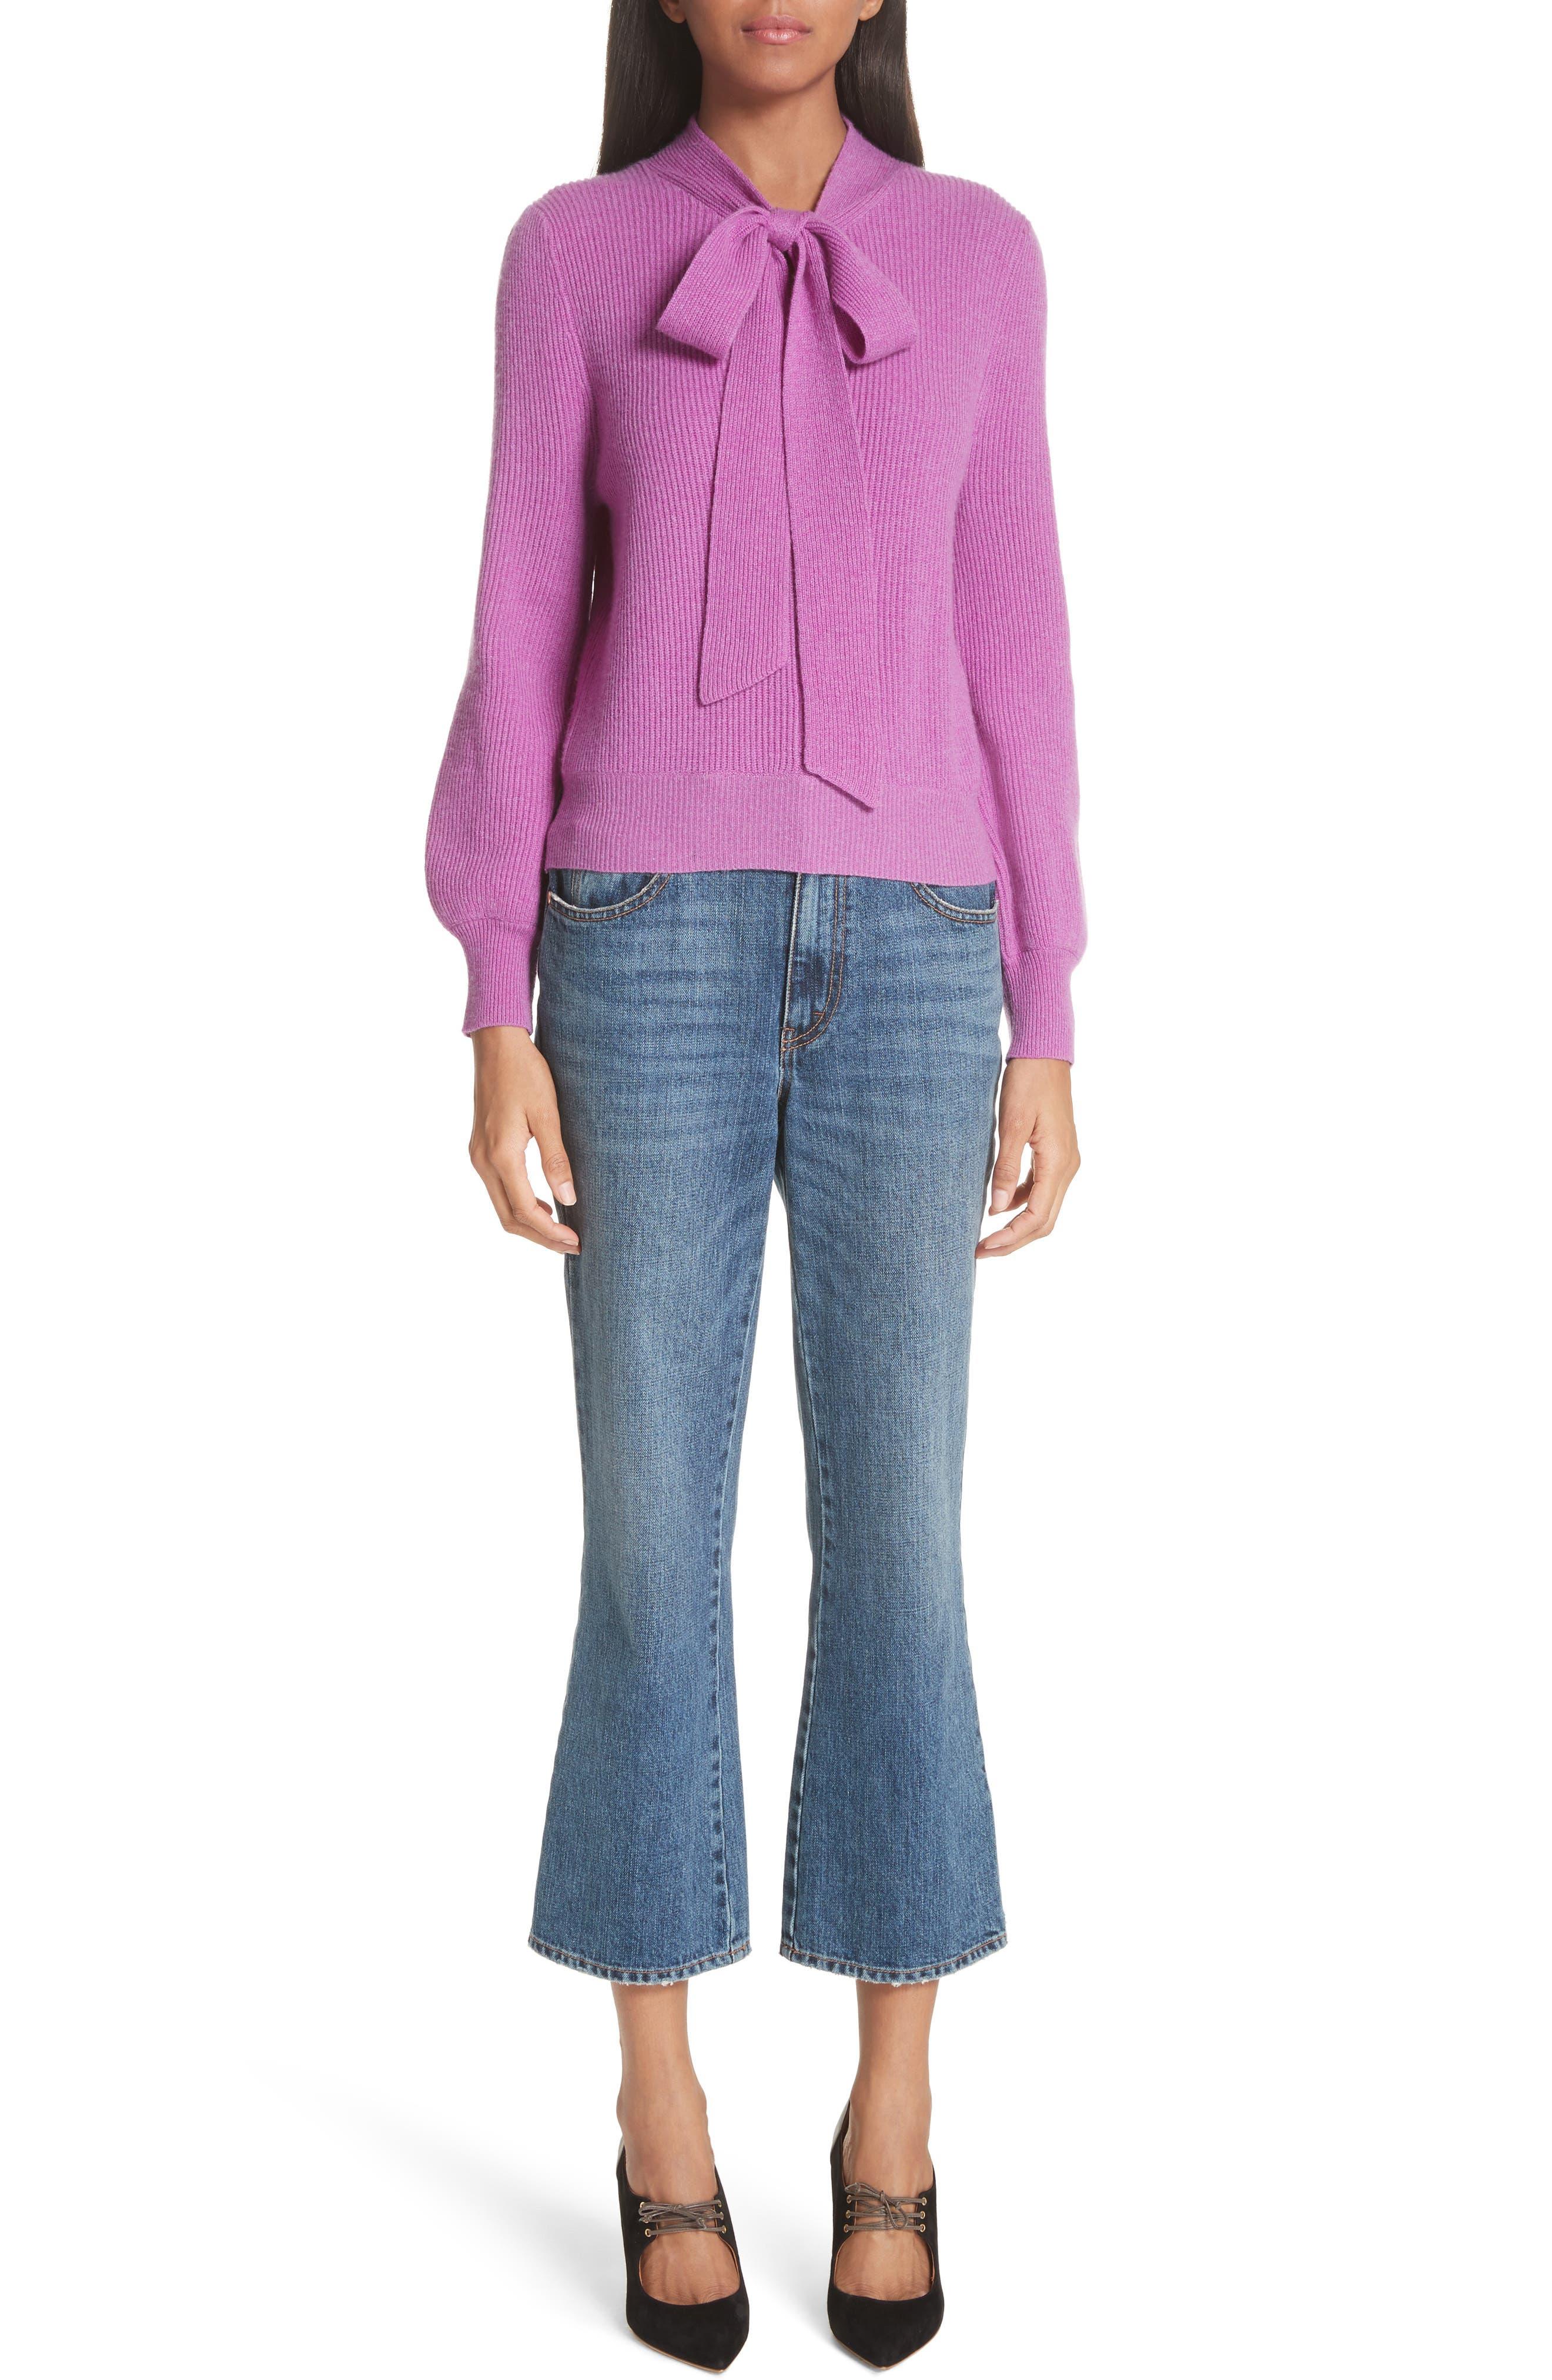 CO,                             Tie Neck Cashmere Sweater,                             Alternate thumbnail 7, color,                             679